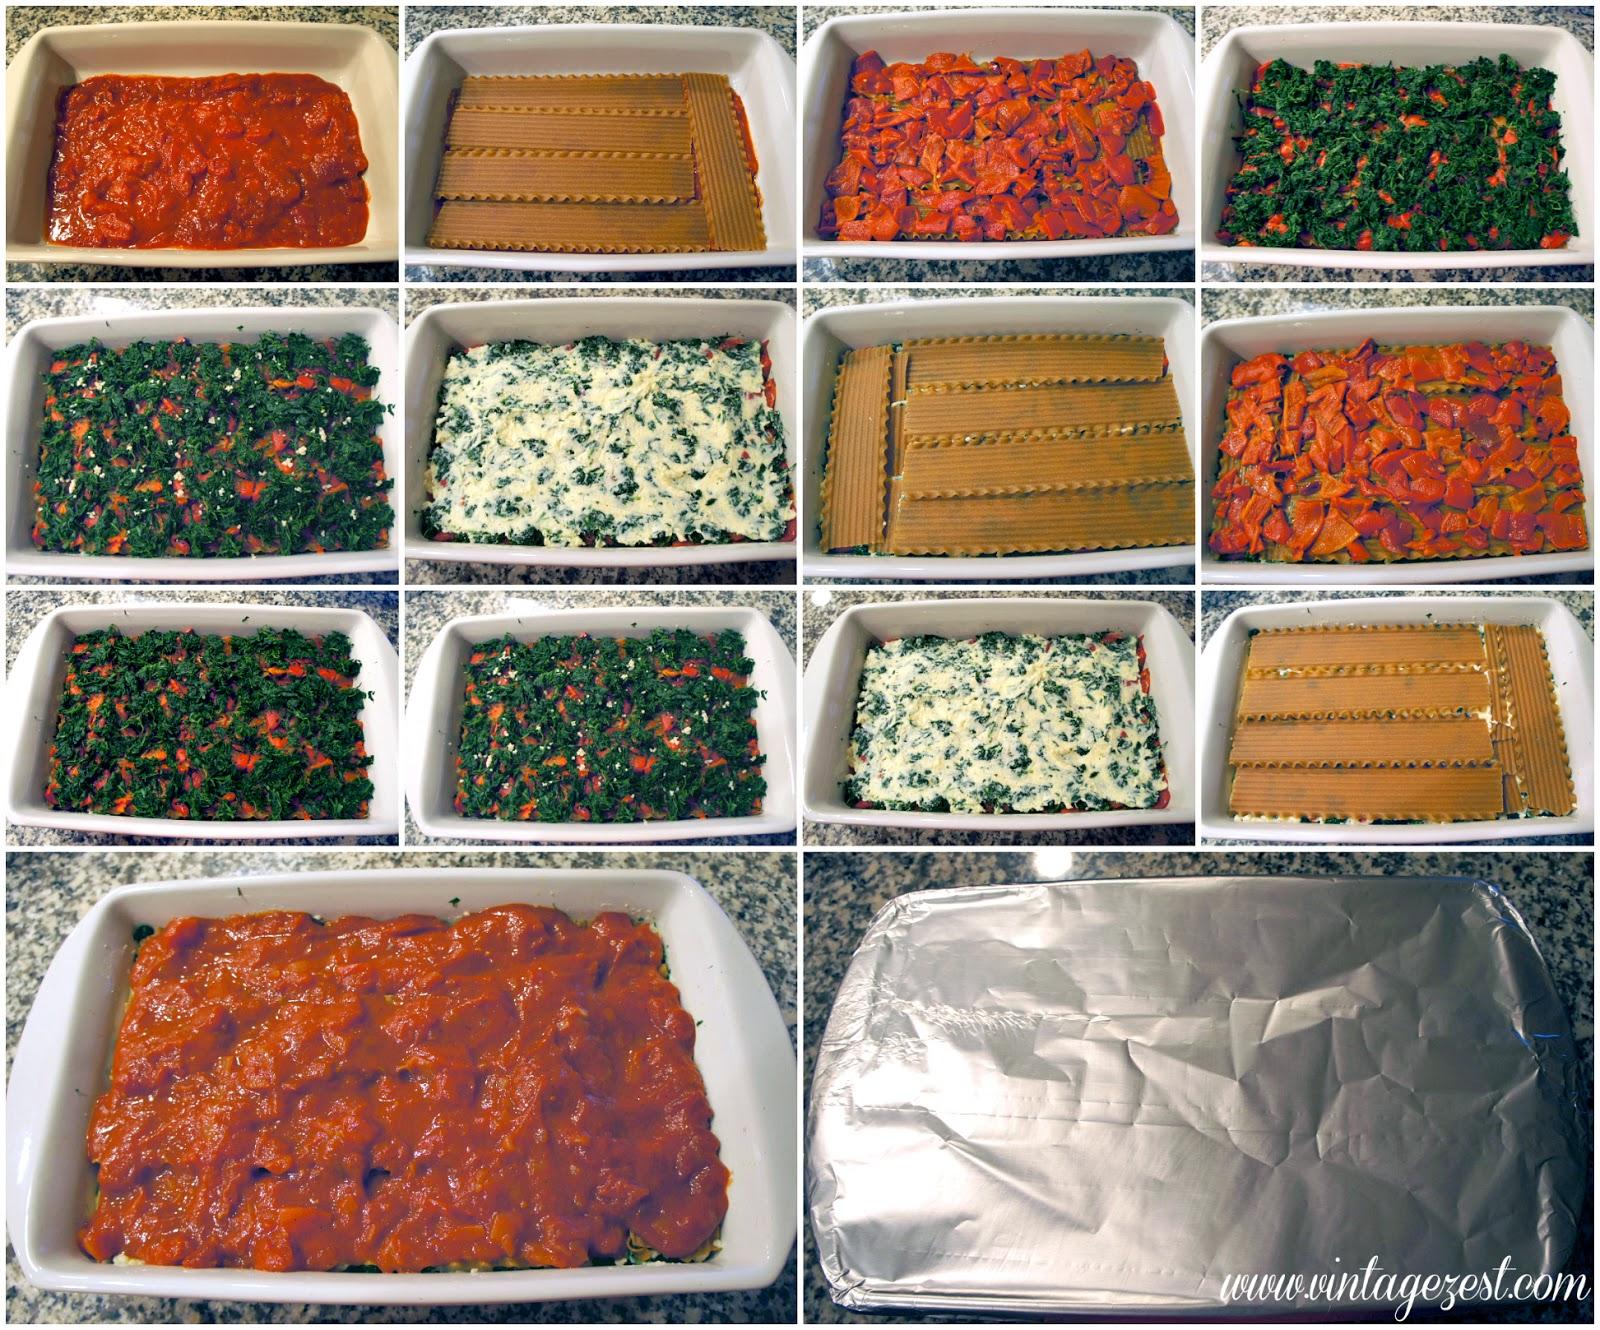 Spinach & Roasted Red Pepper Lasagna on Diane's Vintage Zest!